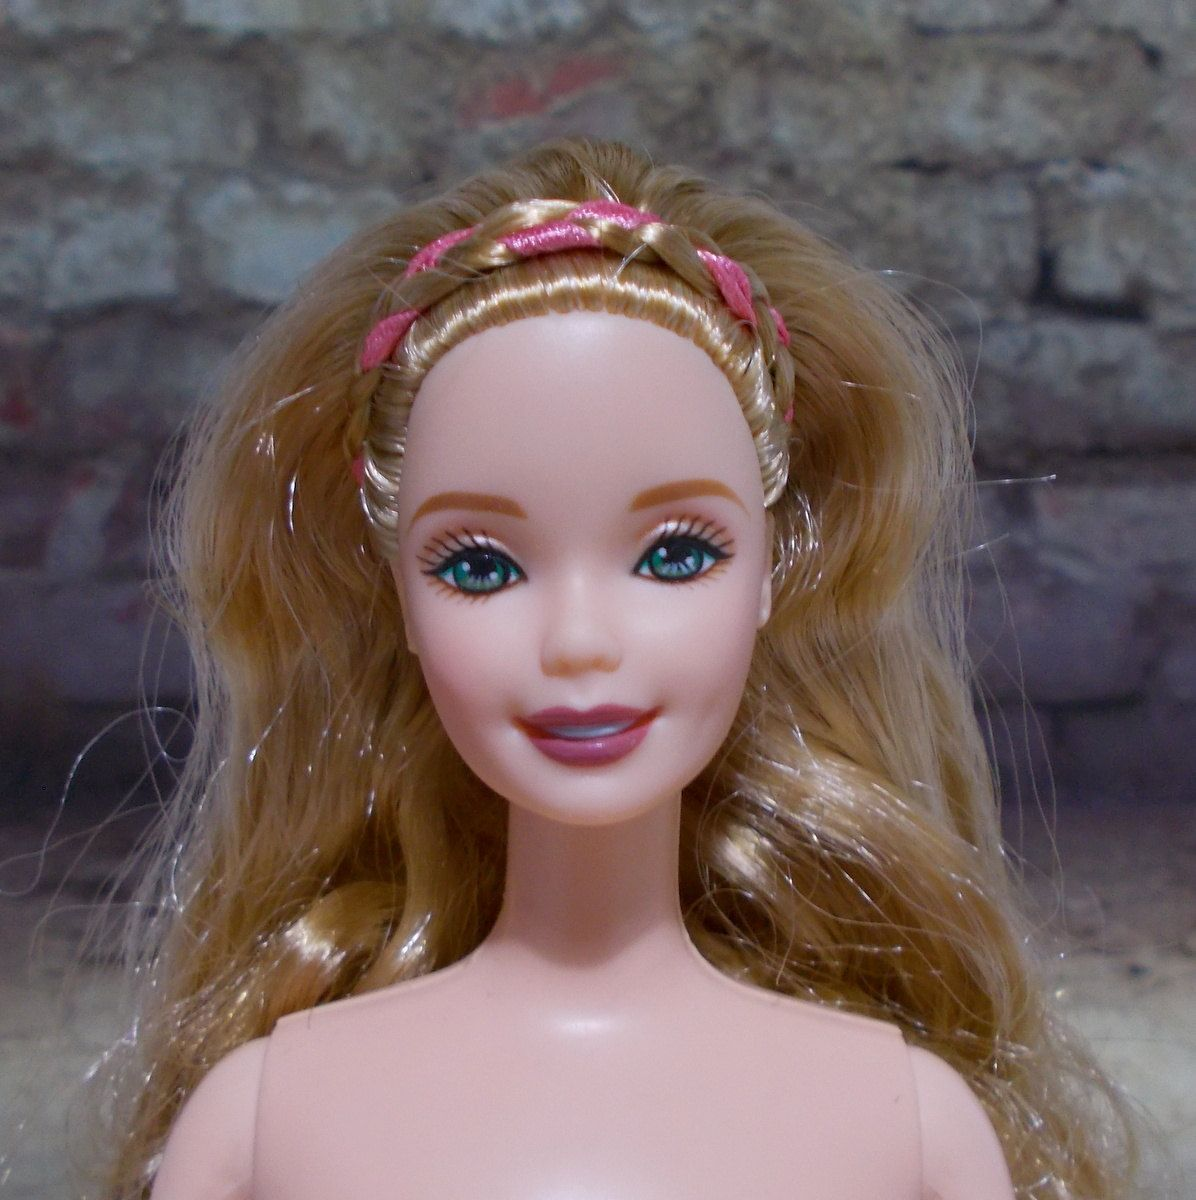 Blonde barbie and pale skin